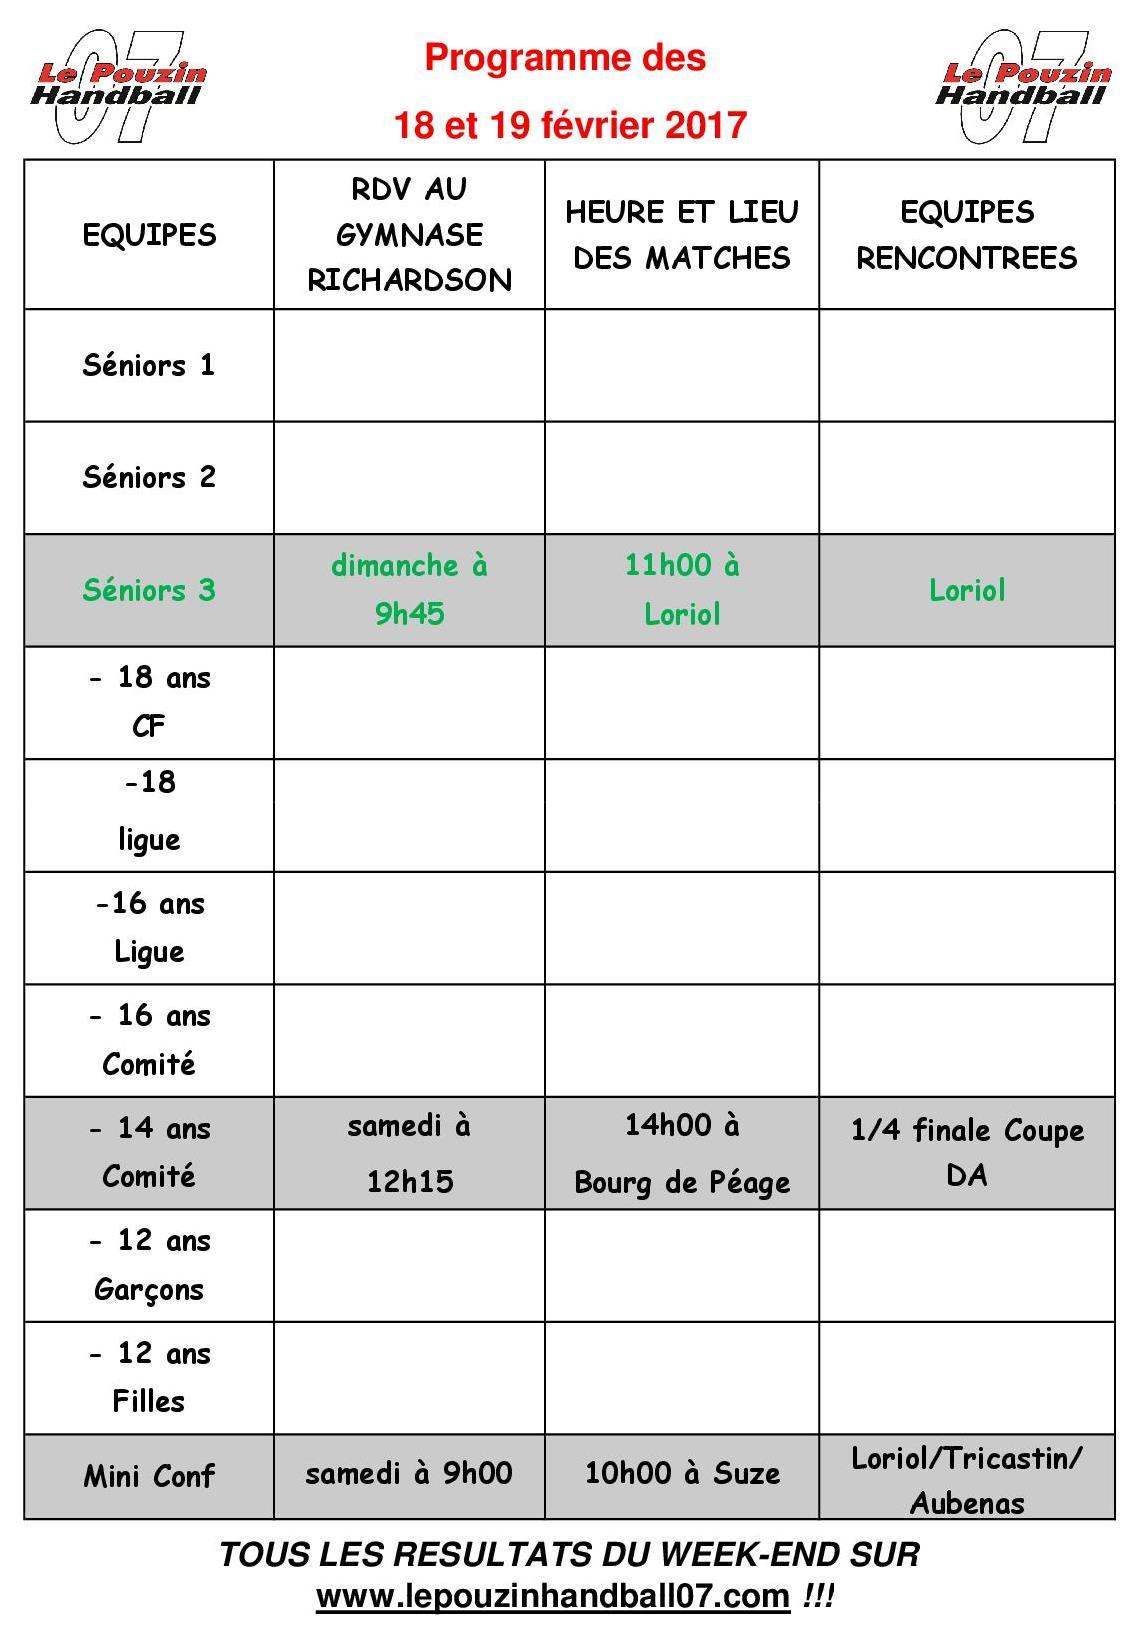 Programme week end 2017 02 18